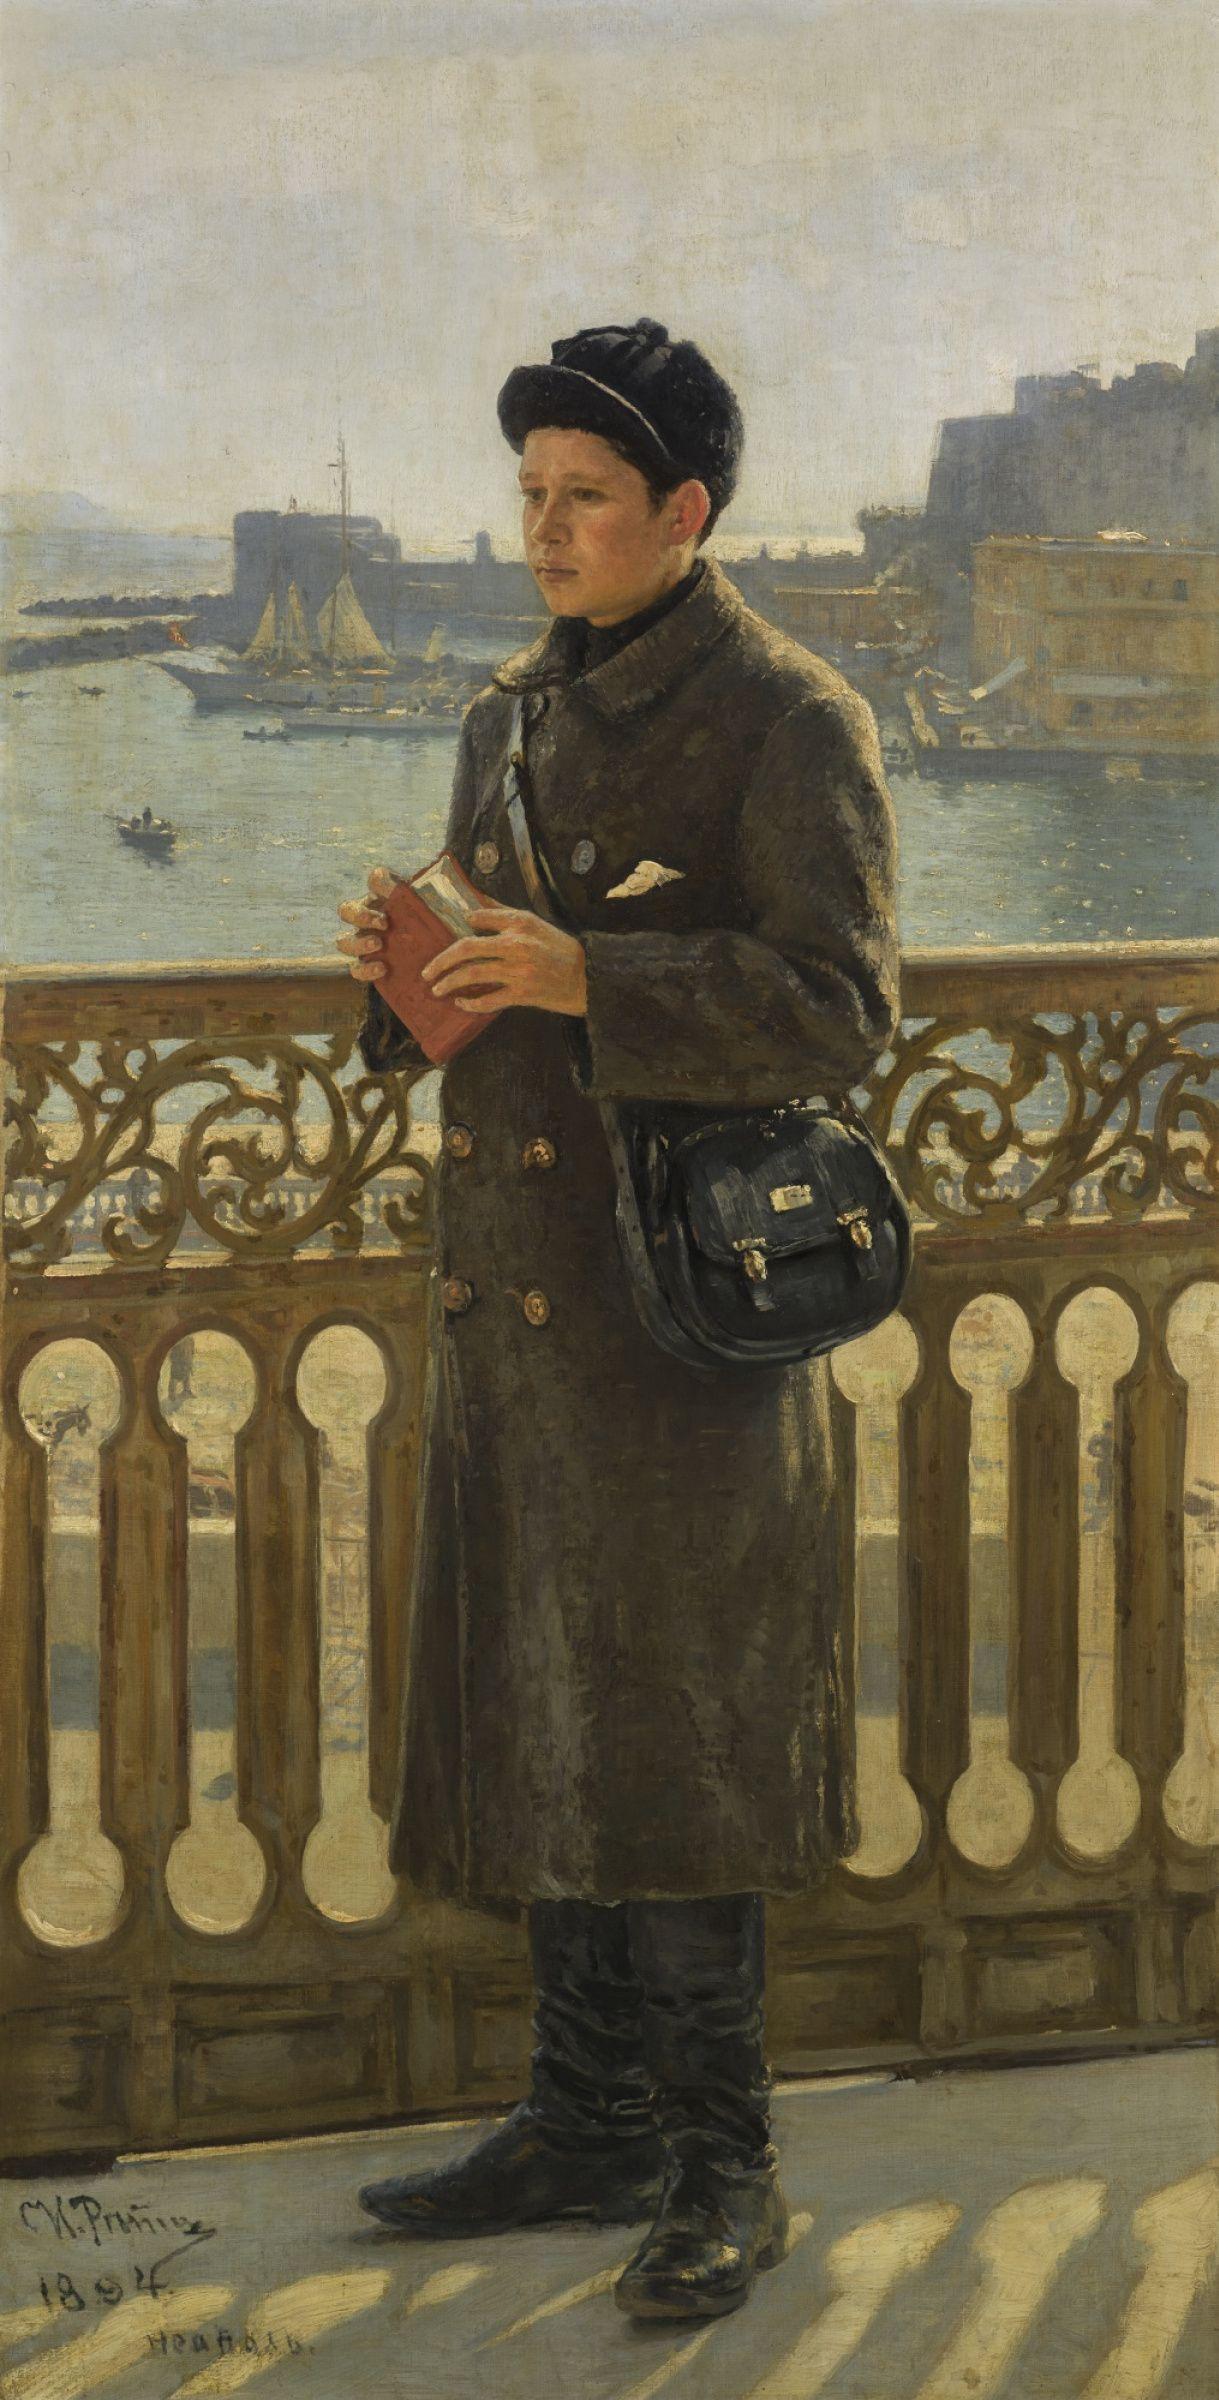 Ilya Efimovich Repin- PORTRAIT OF YURI REPIN BY THE BAY OF NAPLES. фото: Sotheby's